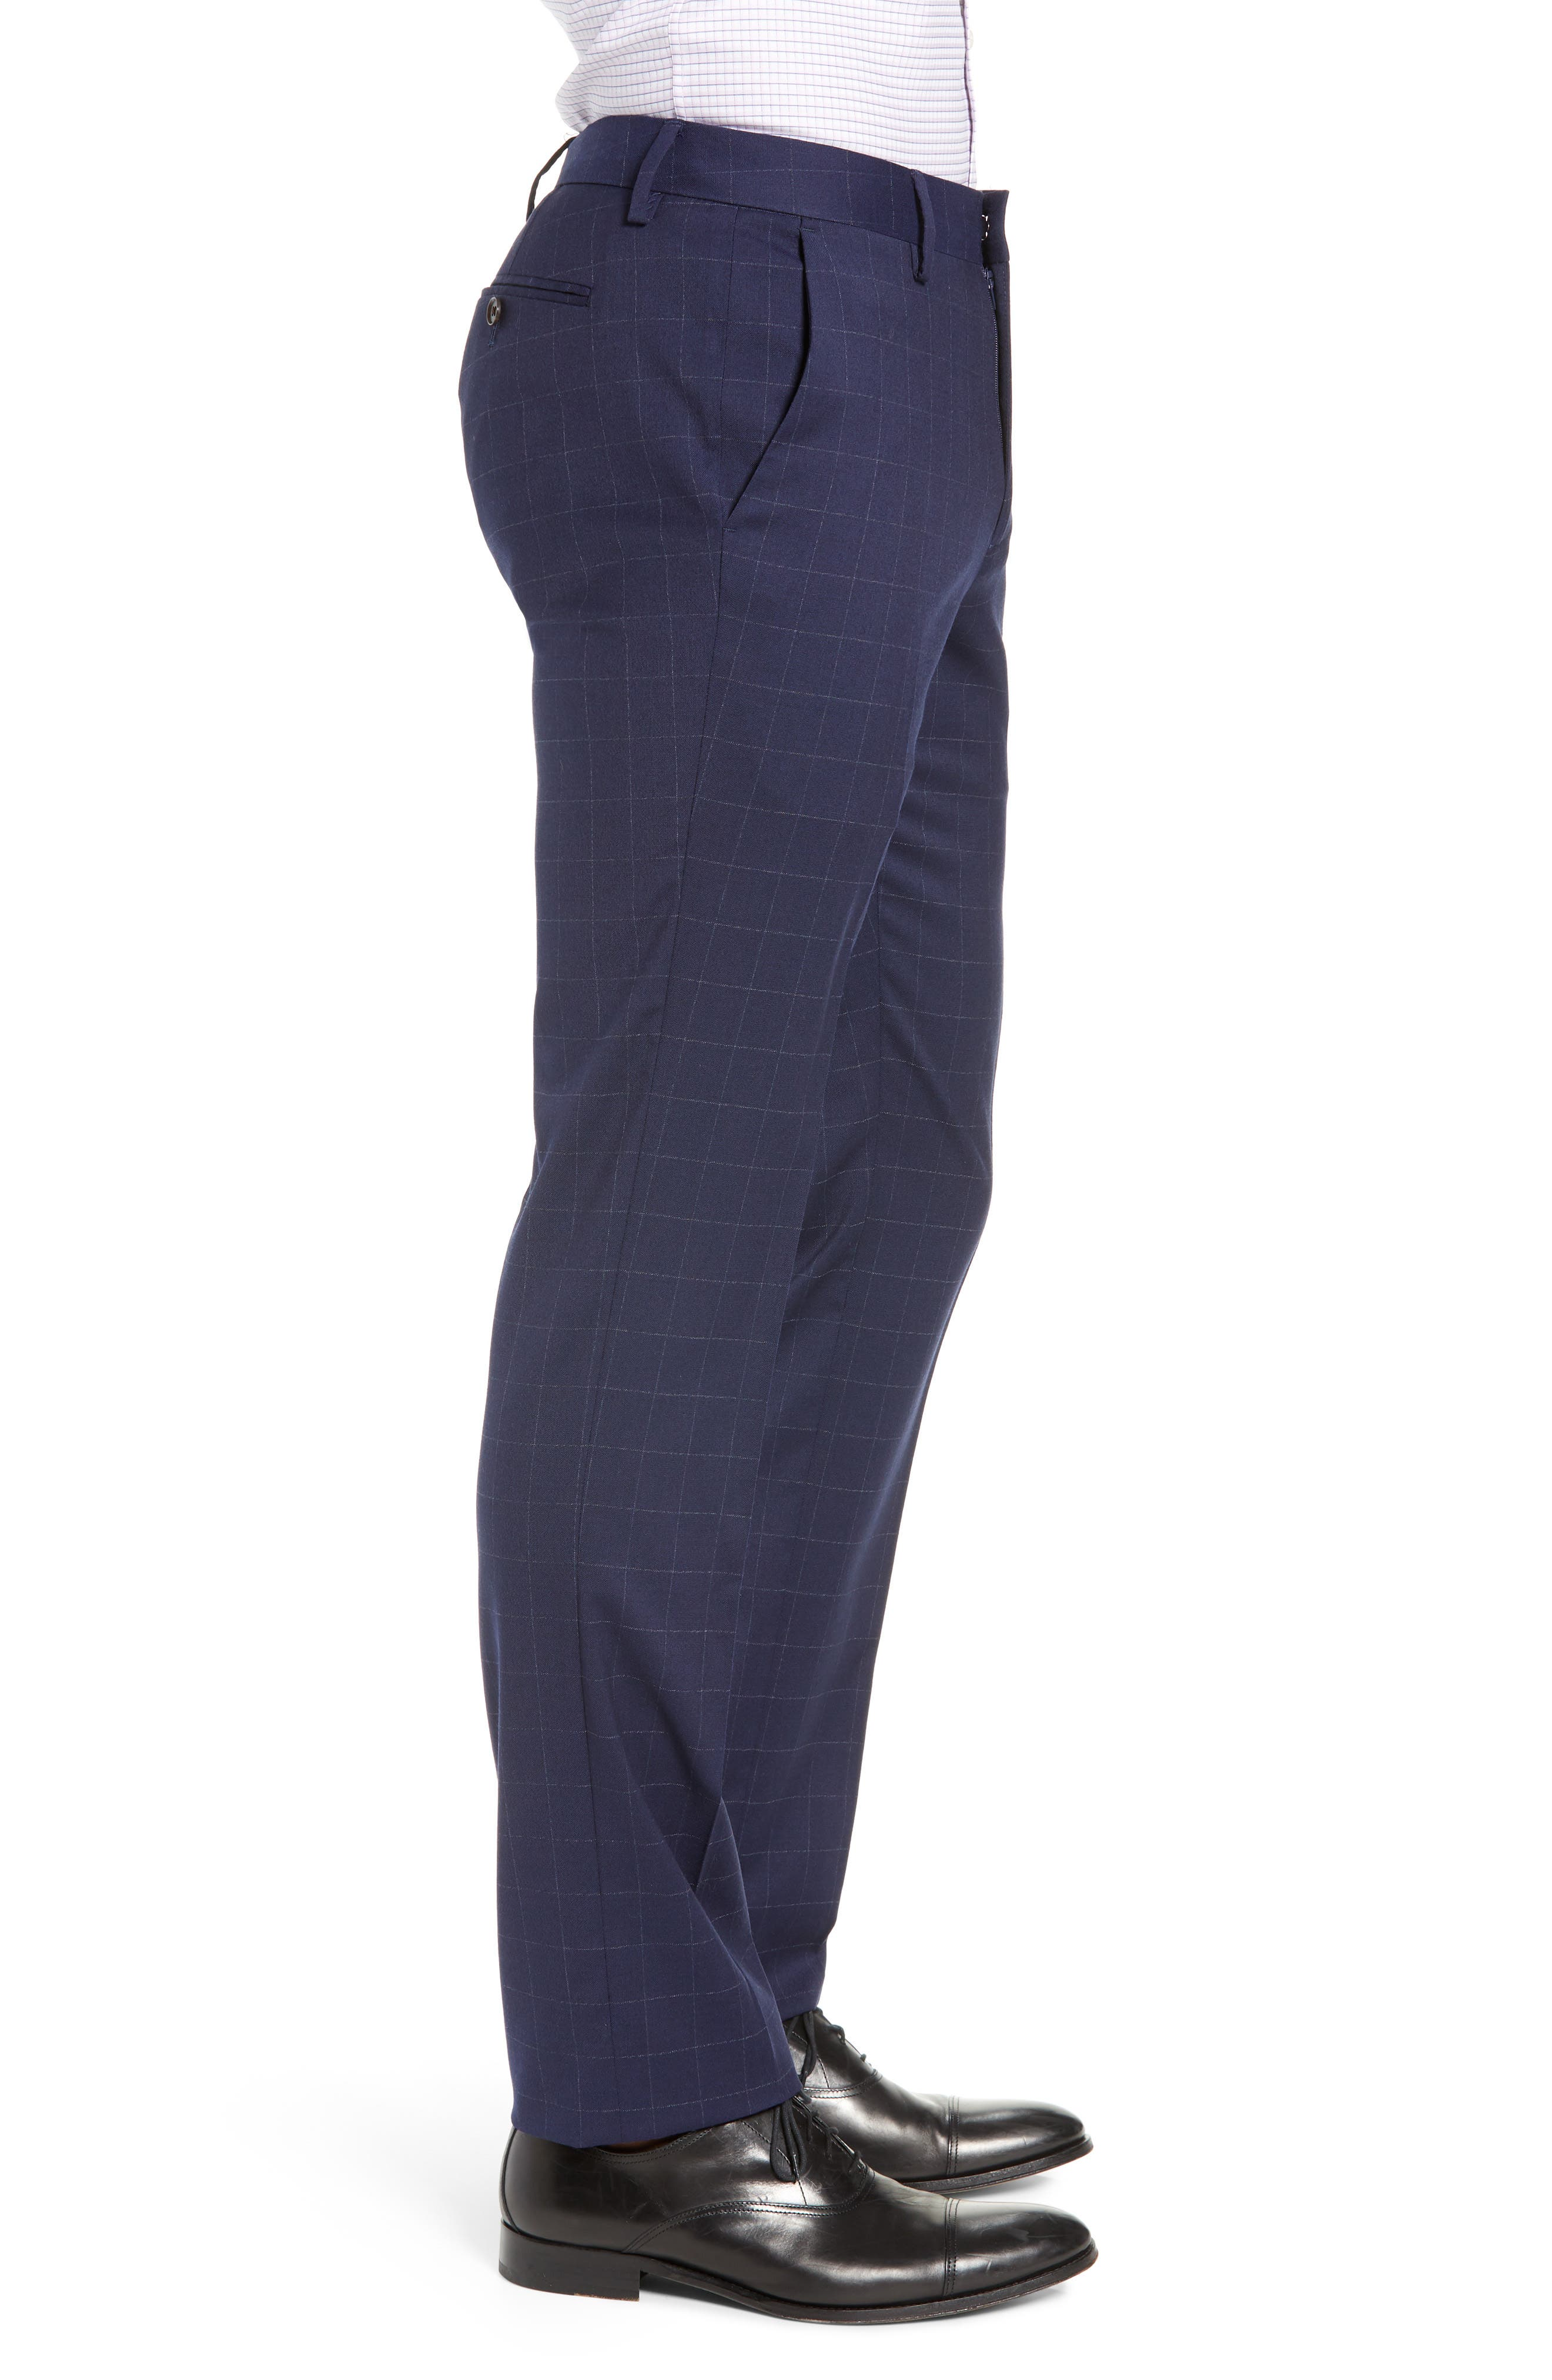 BONOBOS, Jetsetter Slim Fit Stretch Suit Pants, Alternate thumbnail 3, color, NAVY CHALK WINDOWPANE